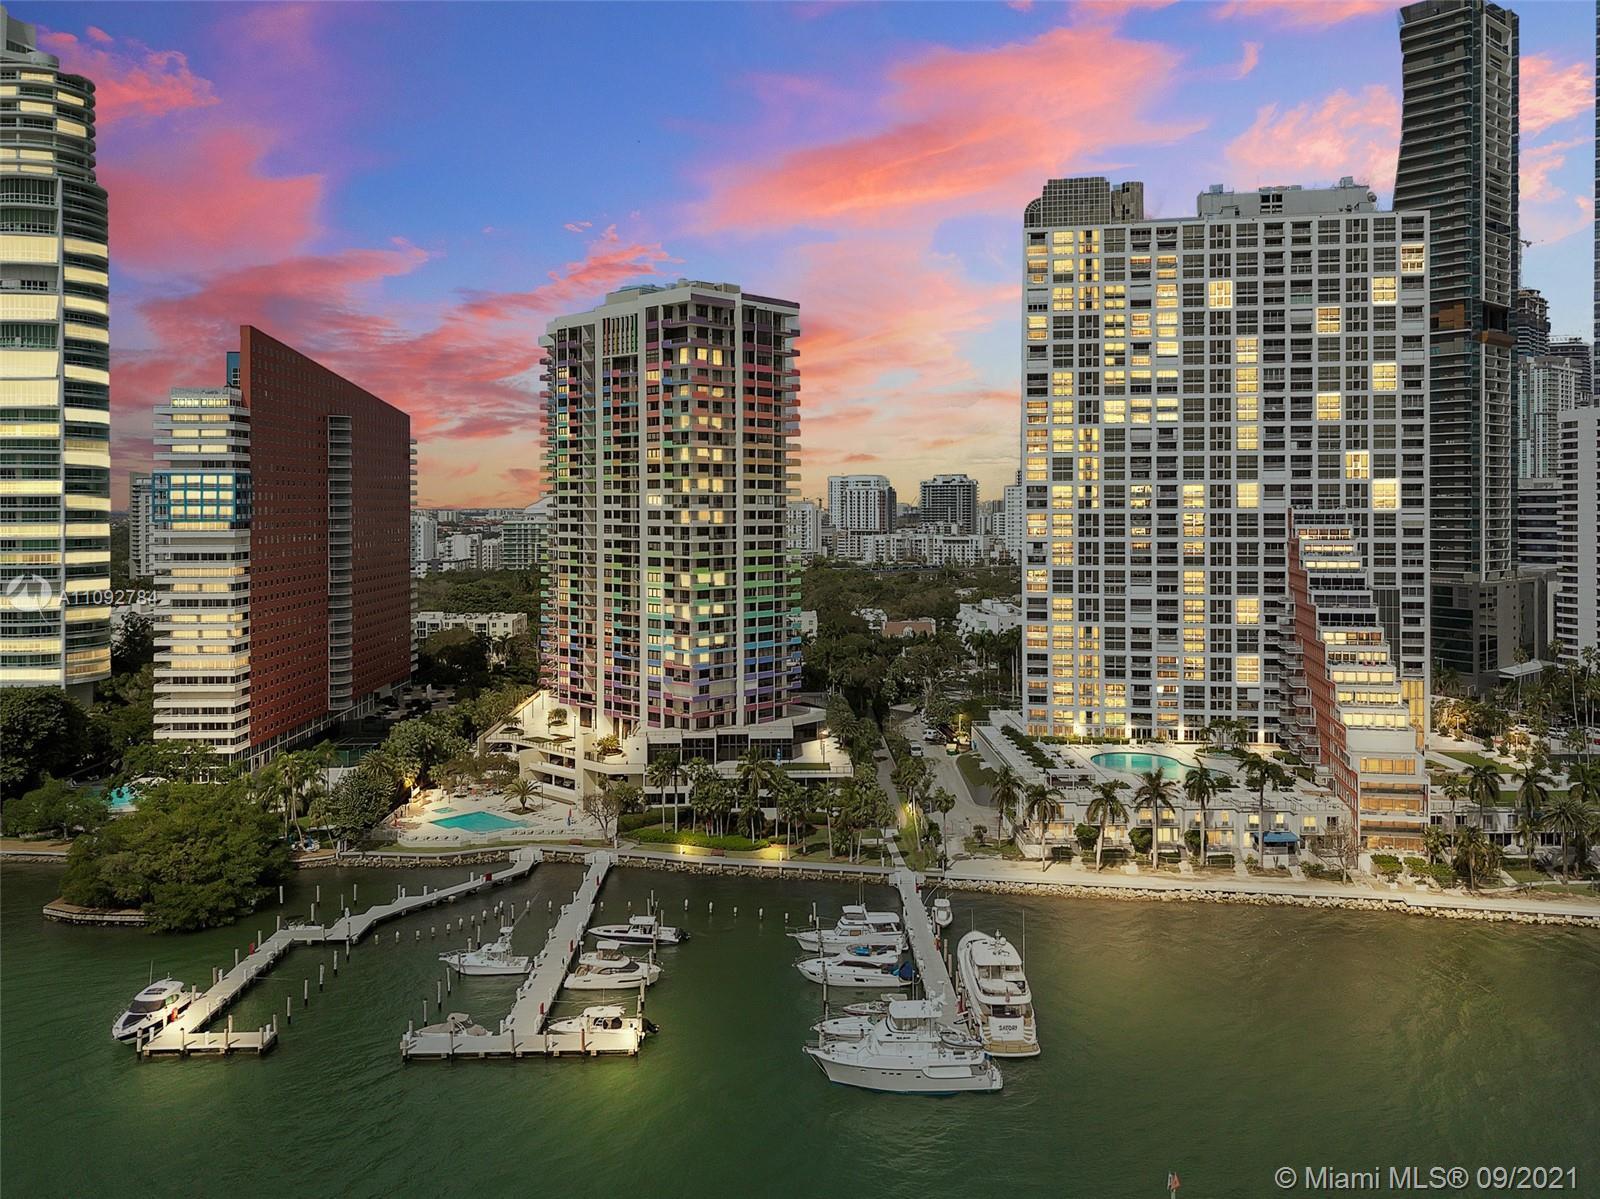 Villa Regina,a luxury full service condominium on desirable Brickell Avenue with 24 hr guard & secur